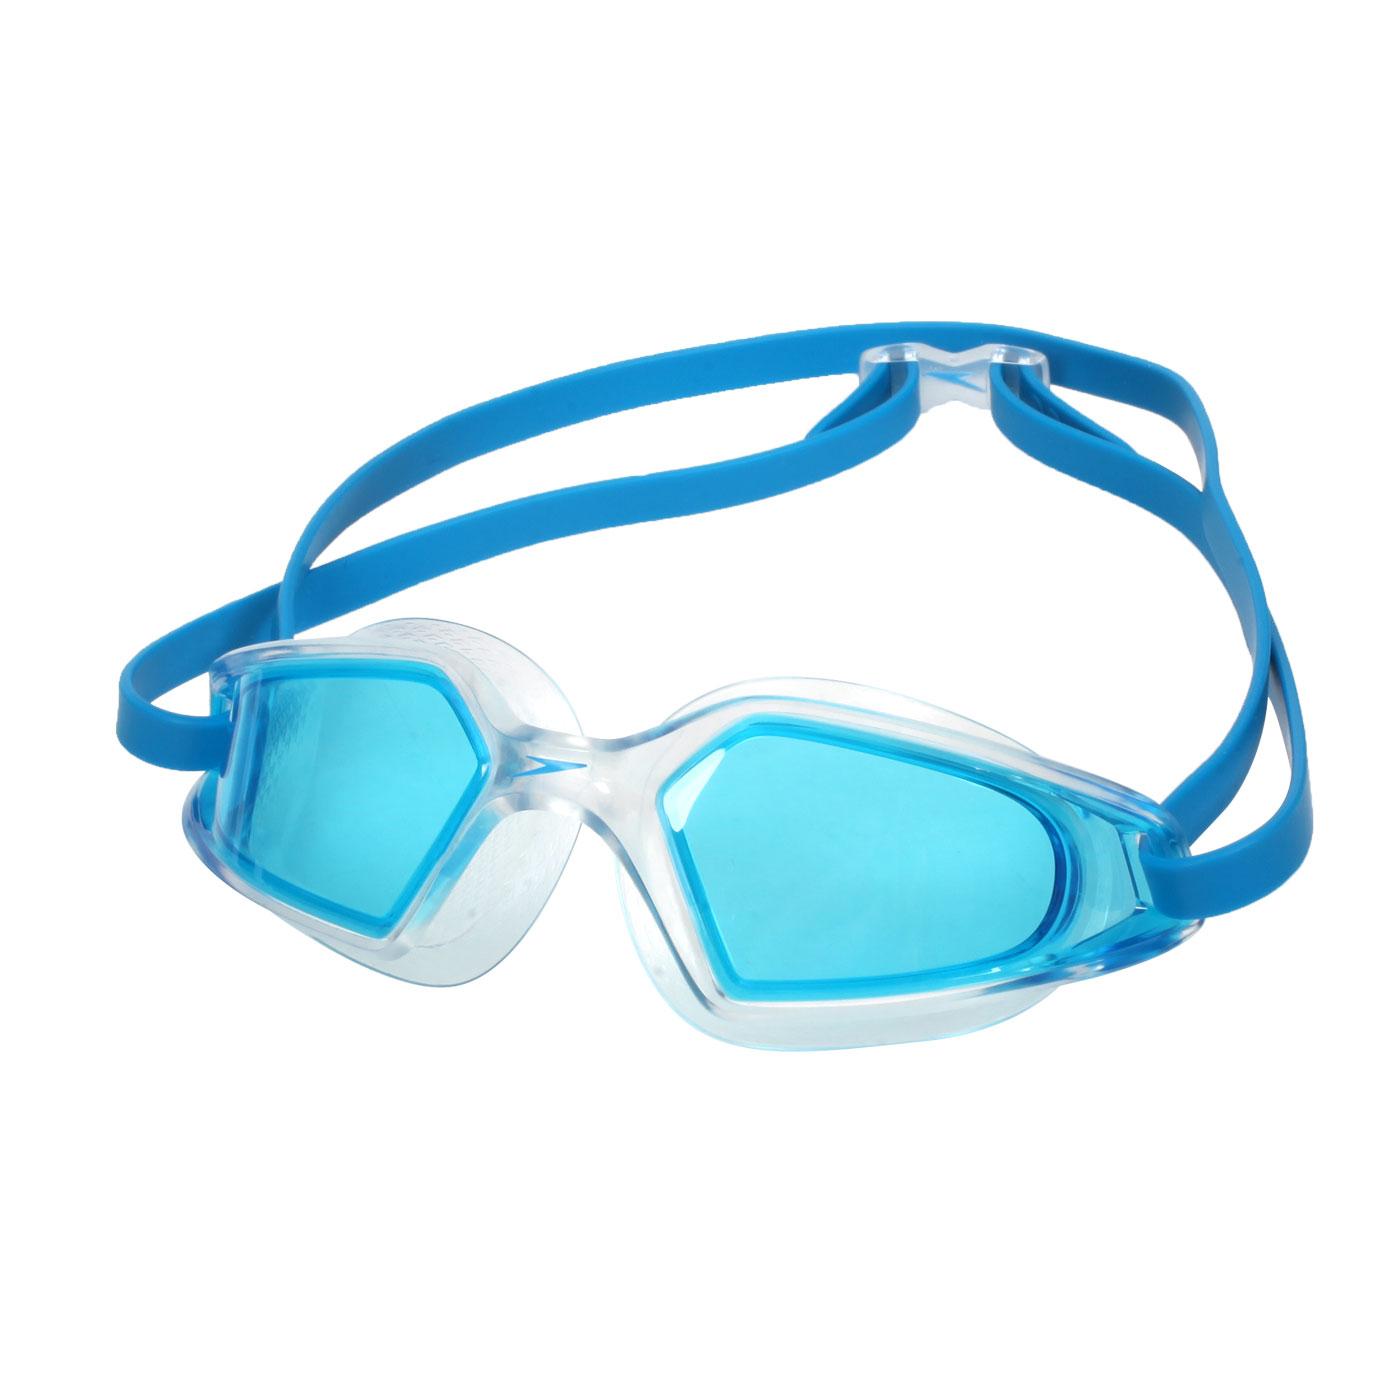 SPEEDO 成人運動泳鏡 Hydropulse SD812268D647